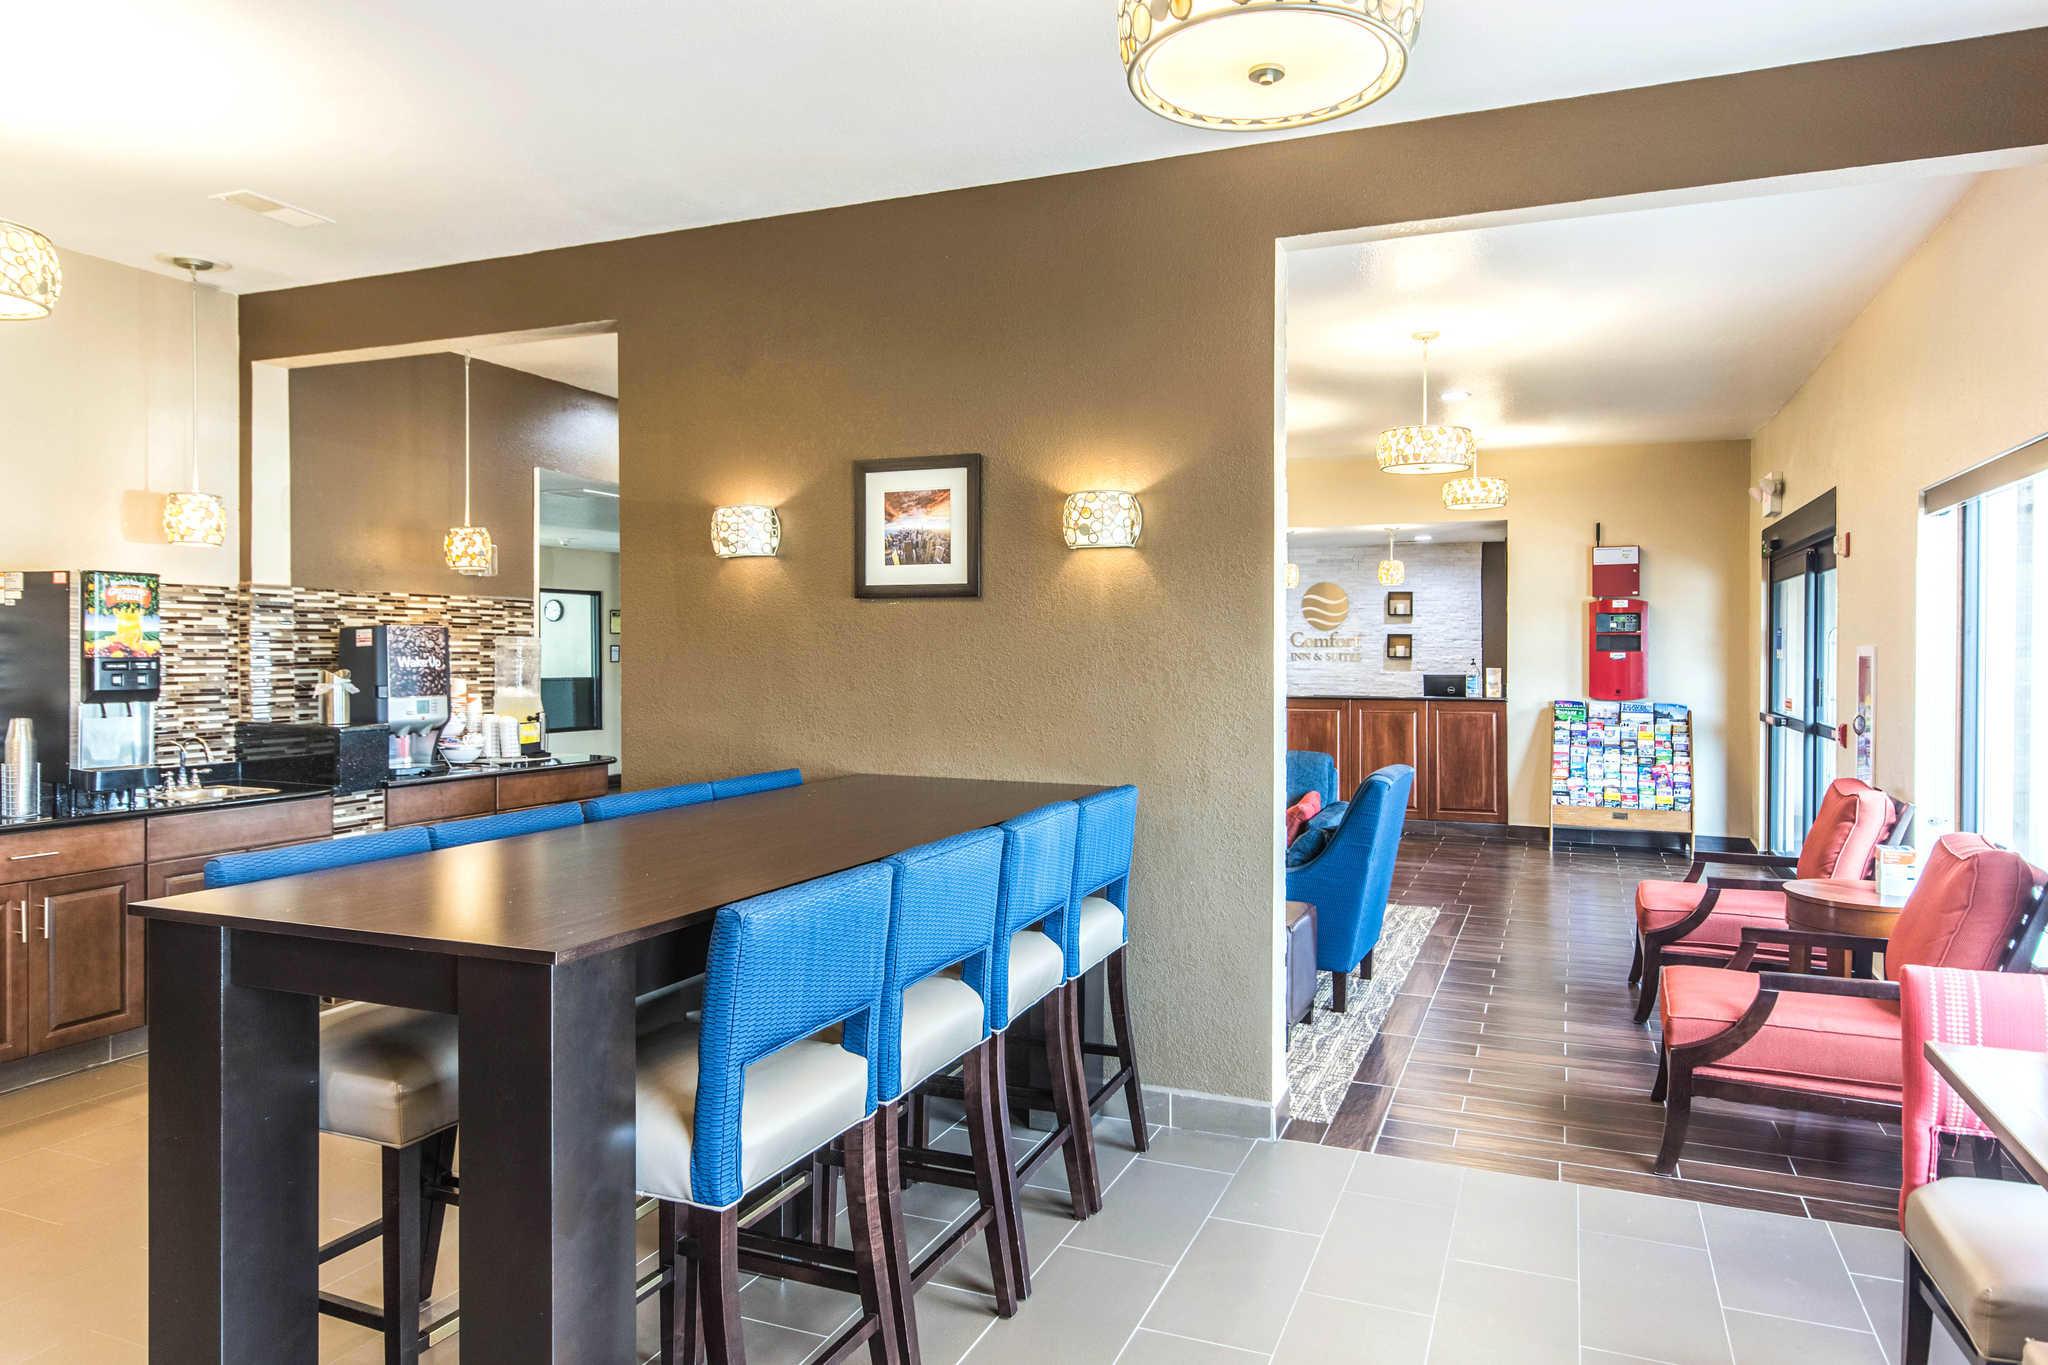 Comfort Inn & Suites North Aurora - Naperville image 8